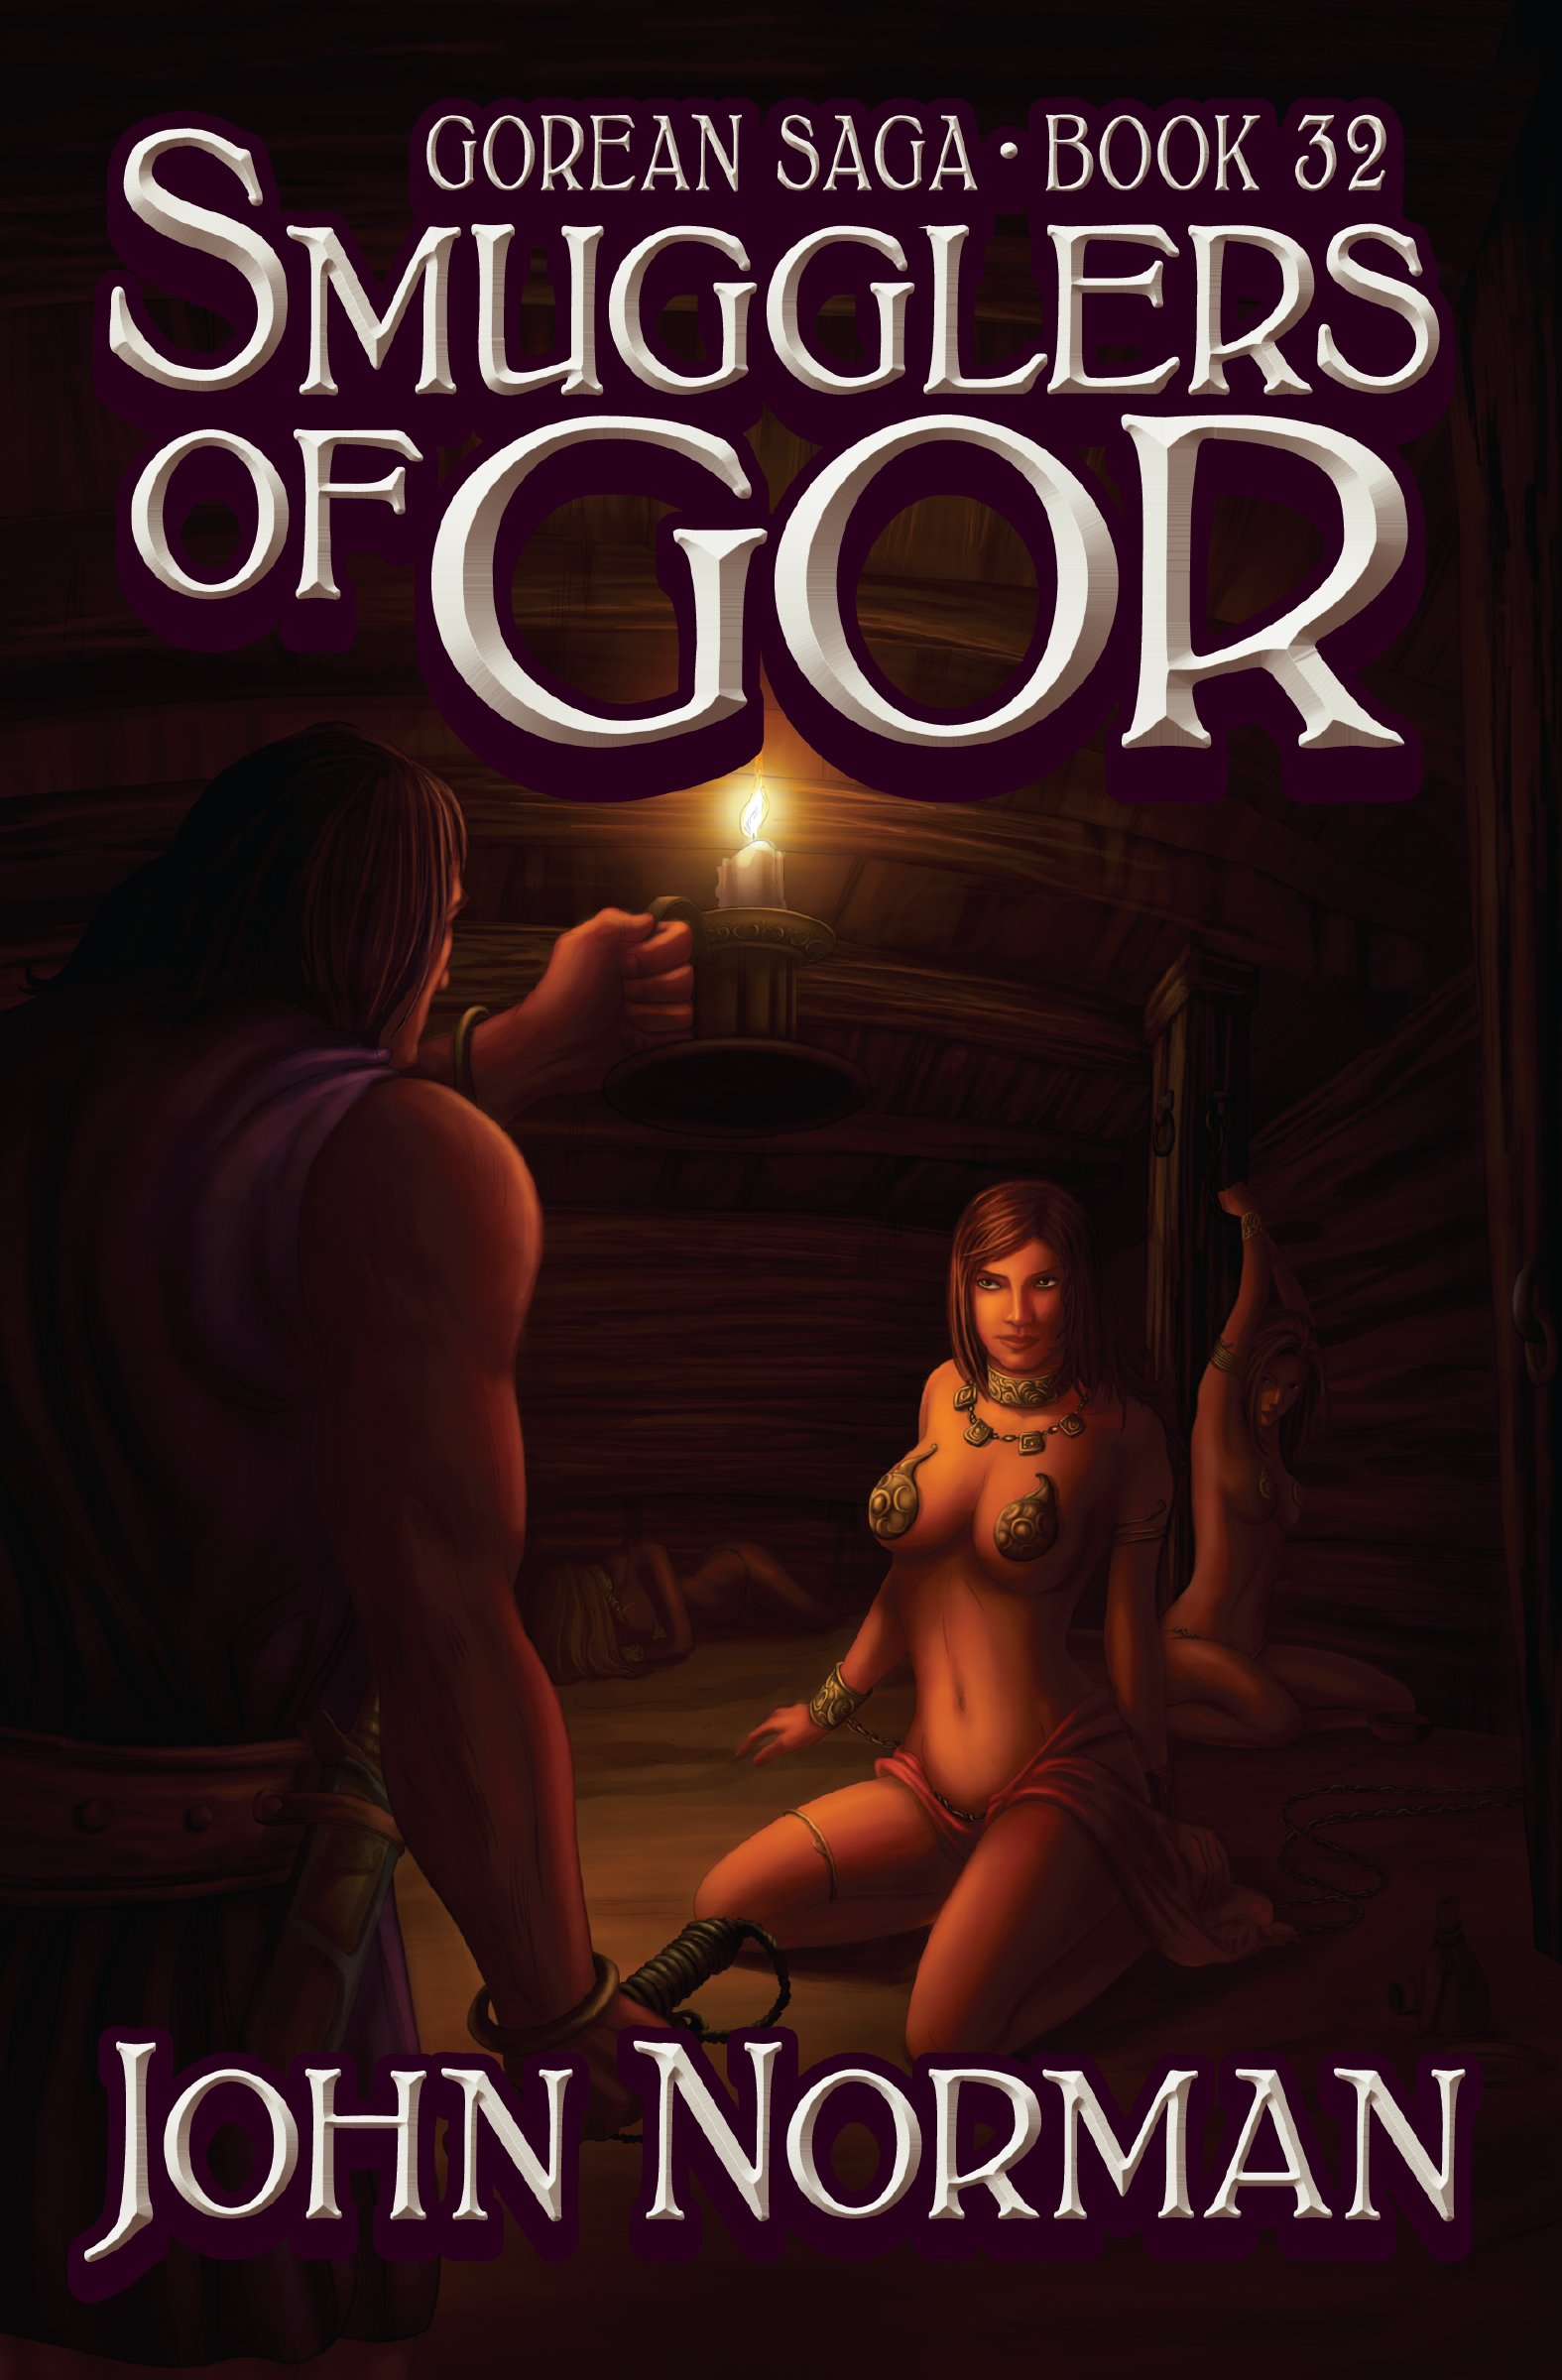 John Norman - Smugglers of Gor (Gor 32)